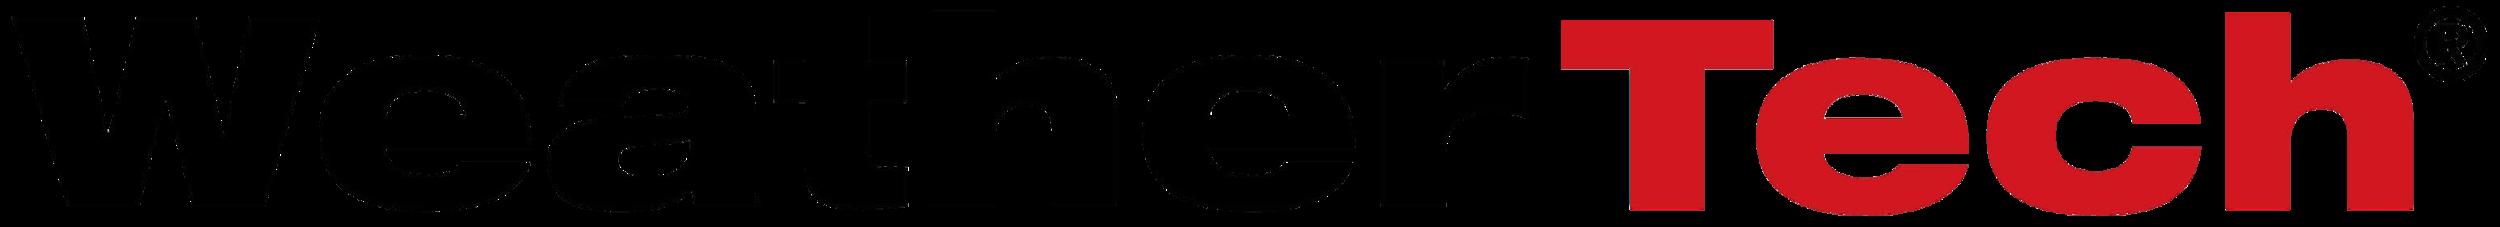 weathertech logo.png